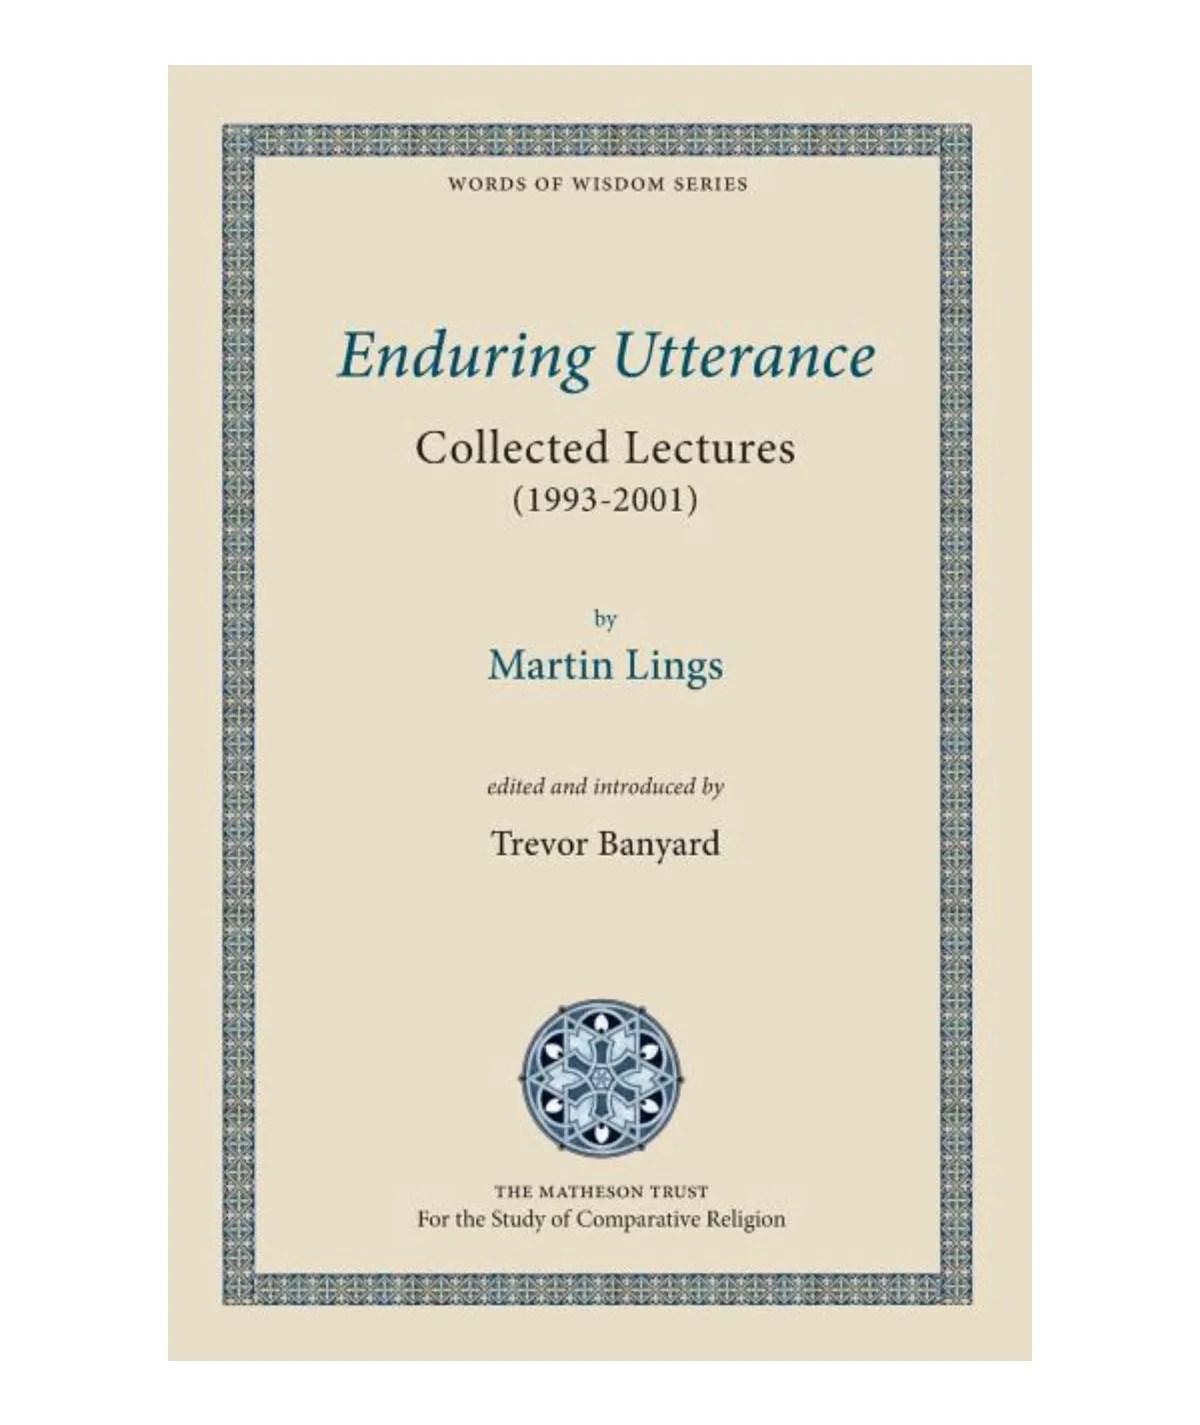 Enduring Utterance: Collected Lectures (1993-2001): Lings, Martin | Banyard, Trevor